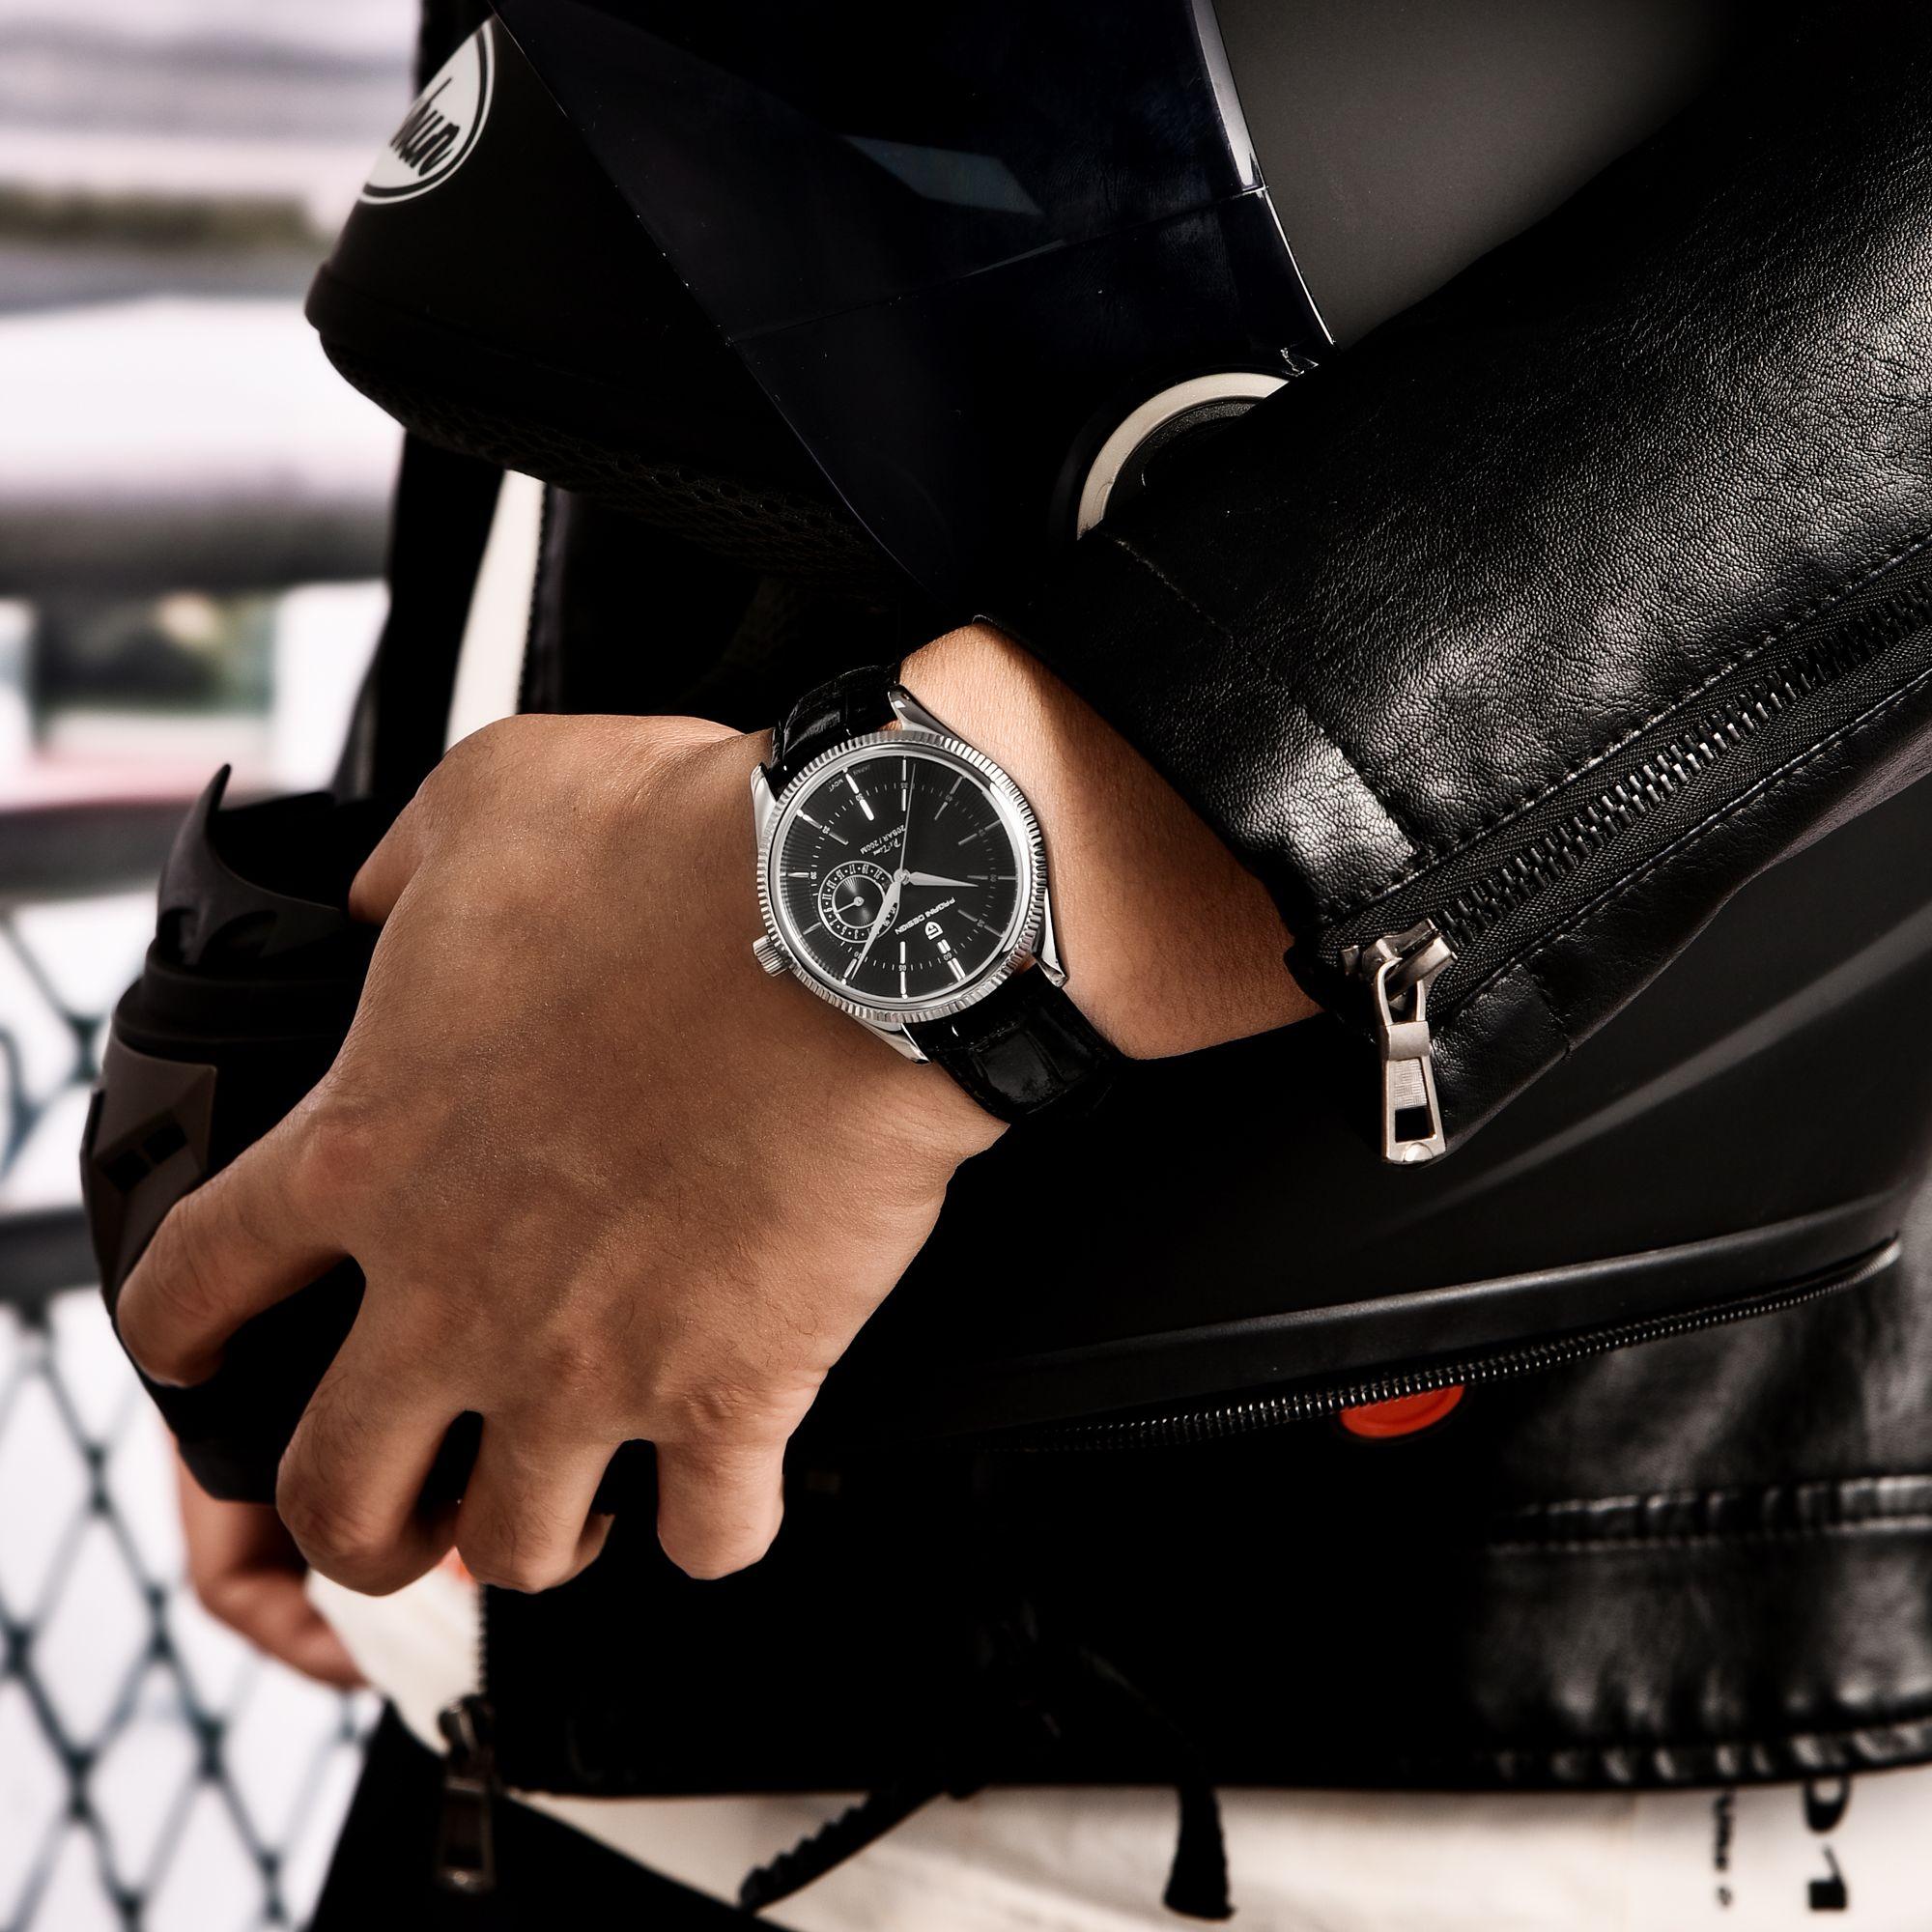 Pagani Design Leather Quartz Watch Sapphire Stainless Steel 200m Waterproof Clock Men's Sports Watch SEIKO VH65 Movement Clock enlarge